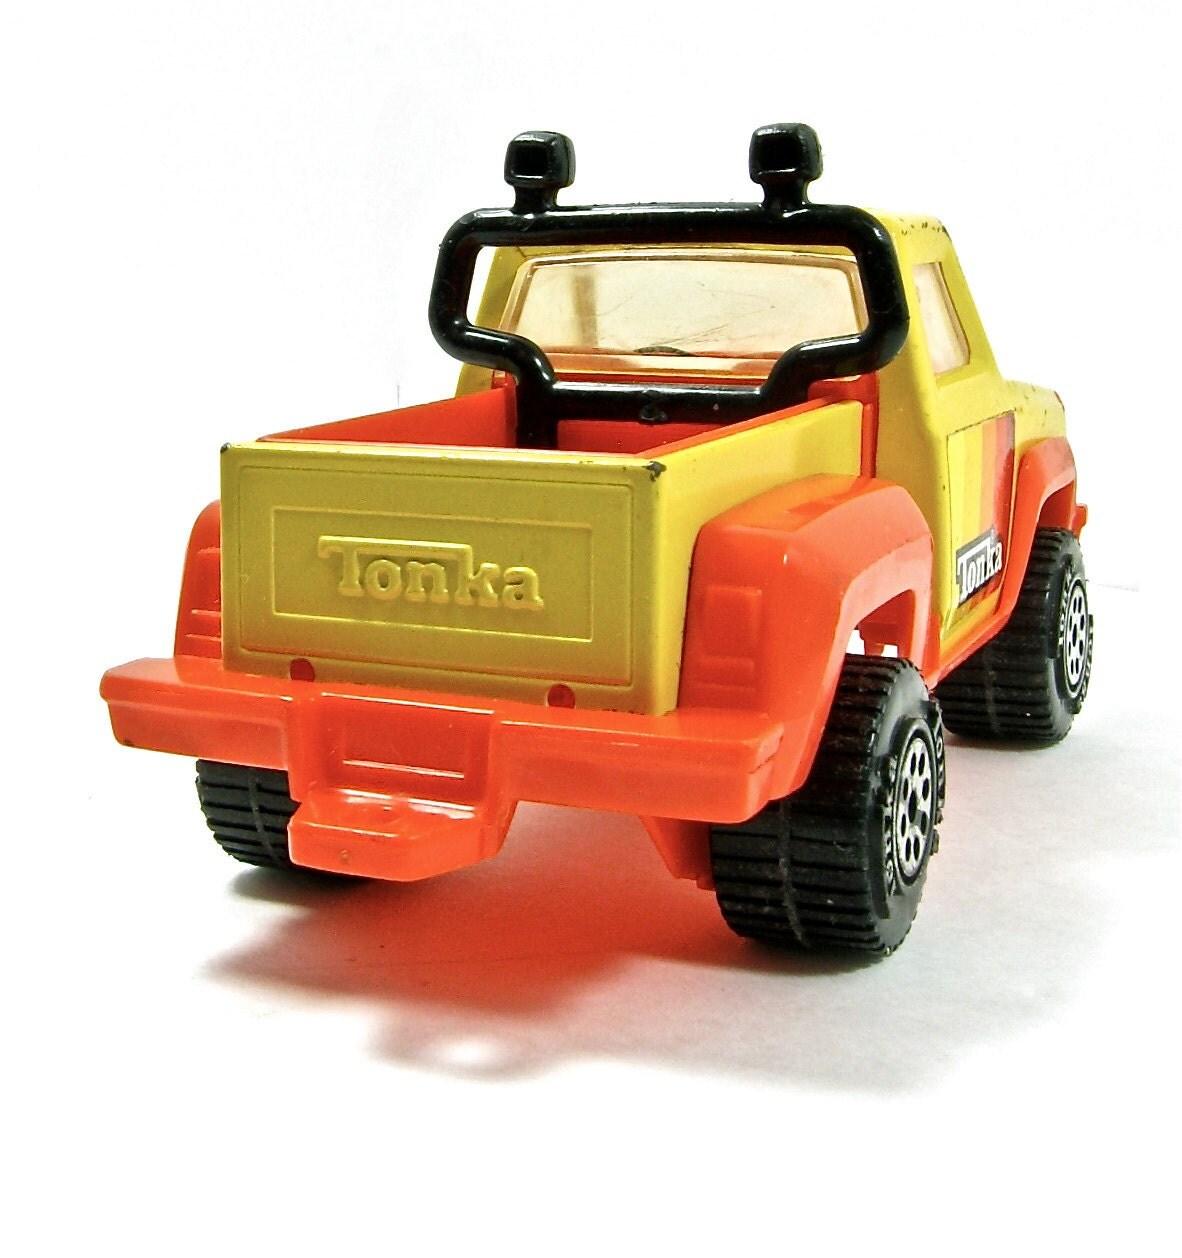 Tonka 4x4 Pickup Truck 1970s - OliveandFrances